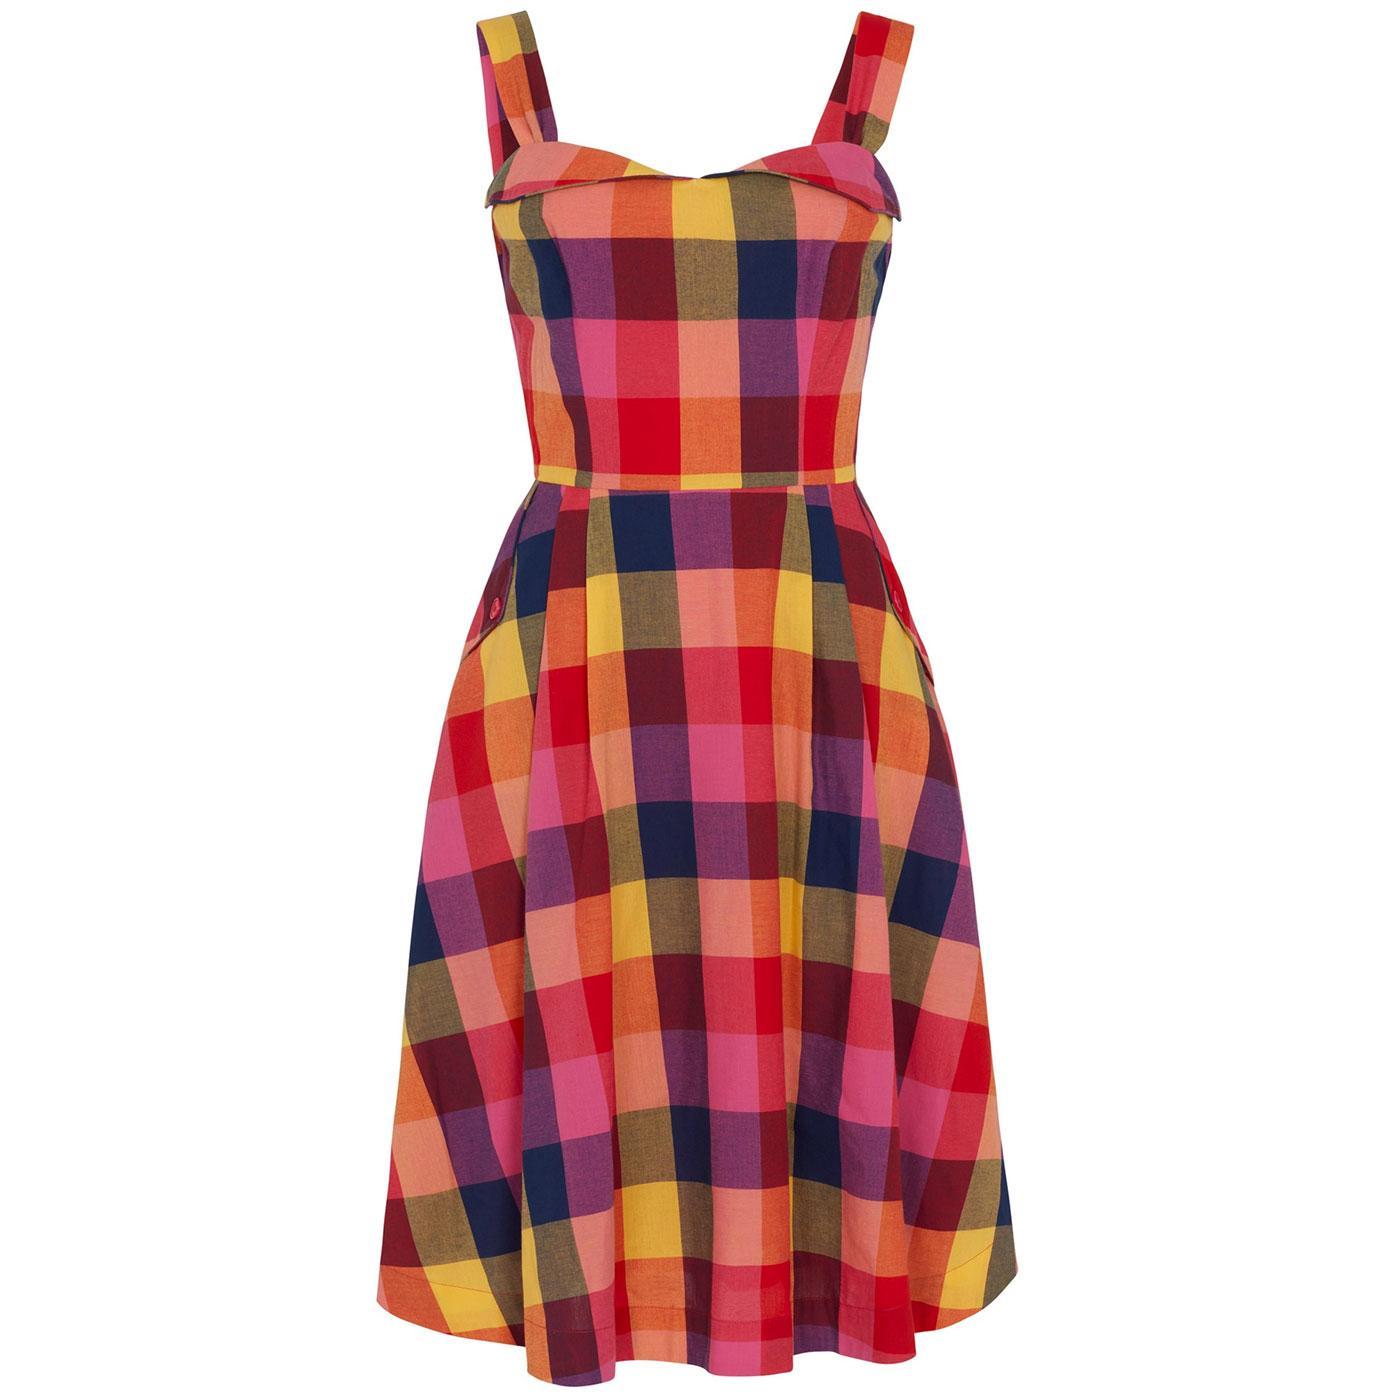 Pippa EMILY & FIN Retro Sunset Plaid Summer Dress